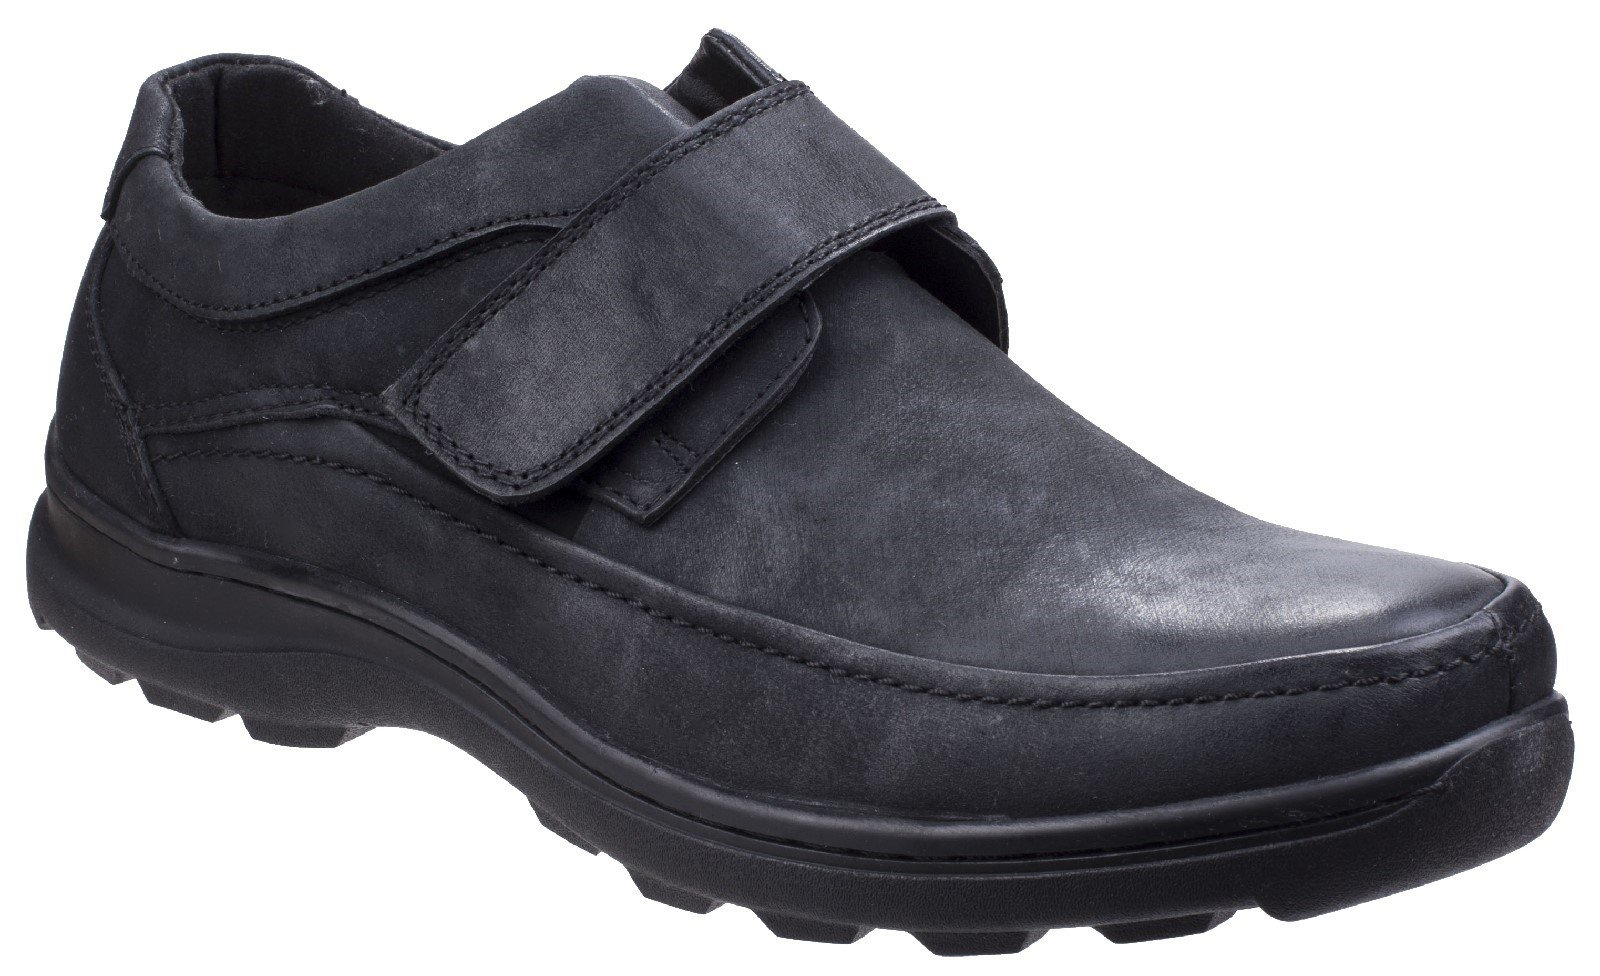 Fleet & Foster Men's Hurghada Fastening Shoe Various Colours 26314-43923 - Black 7